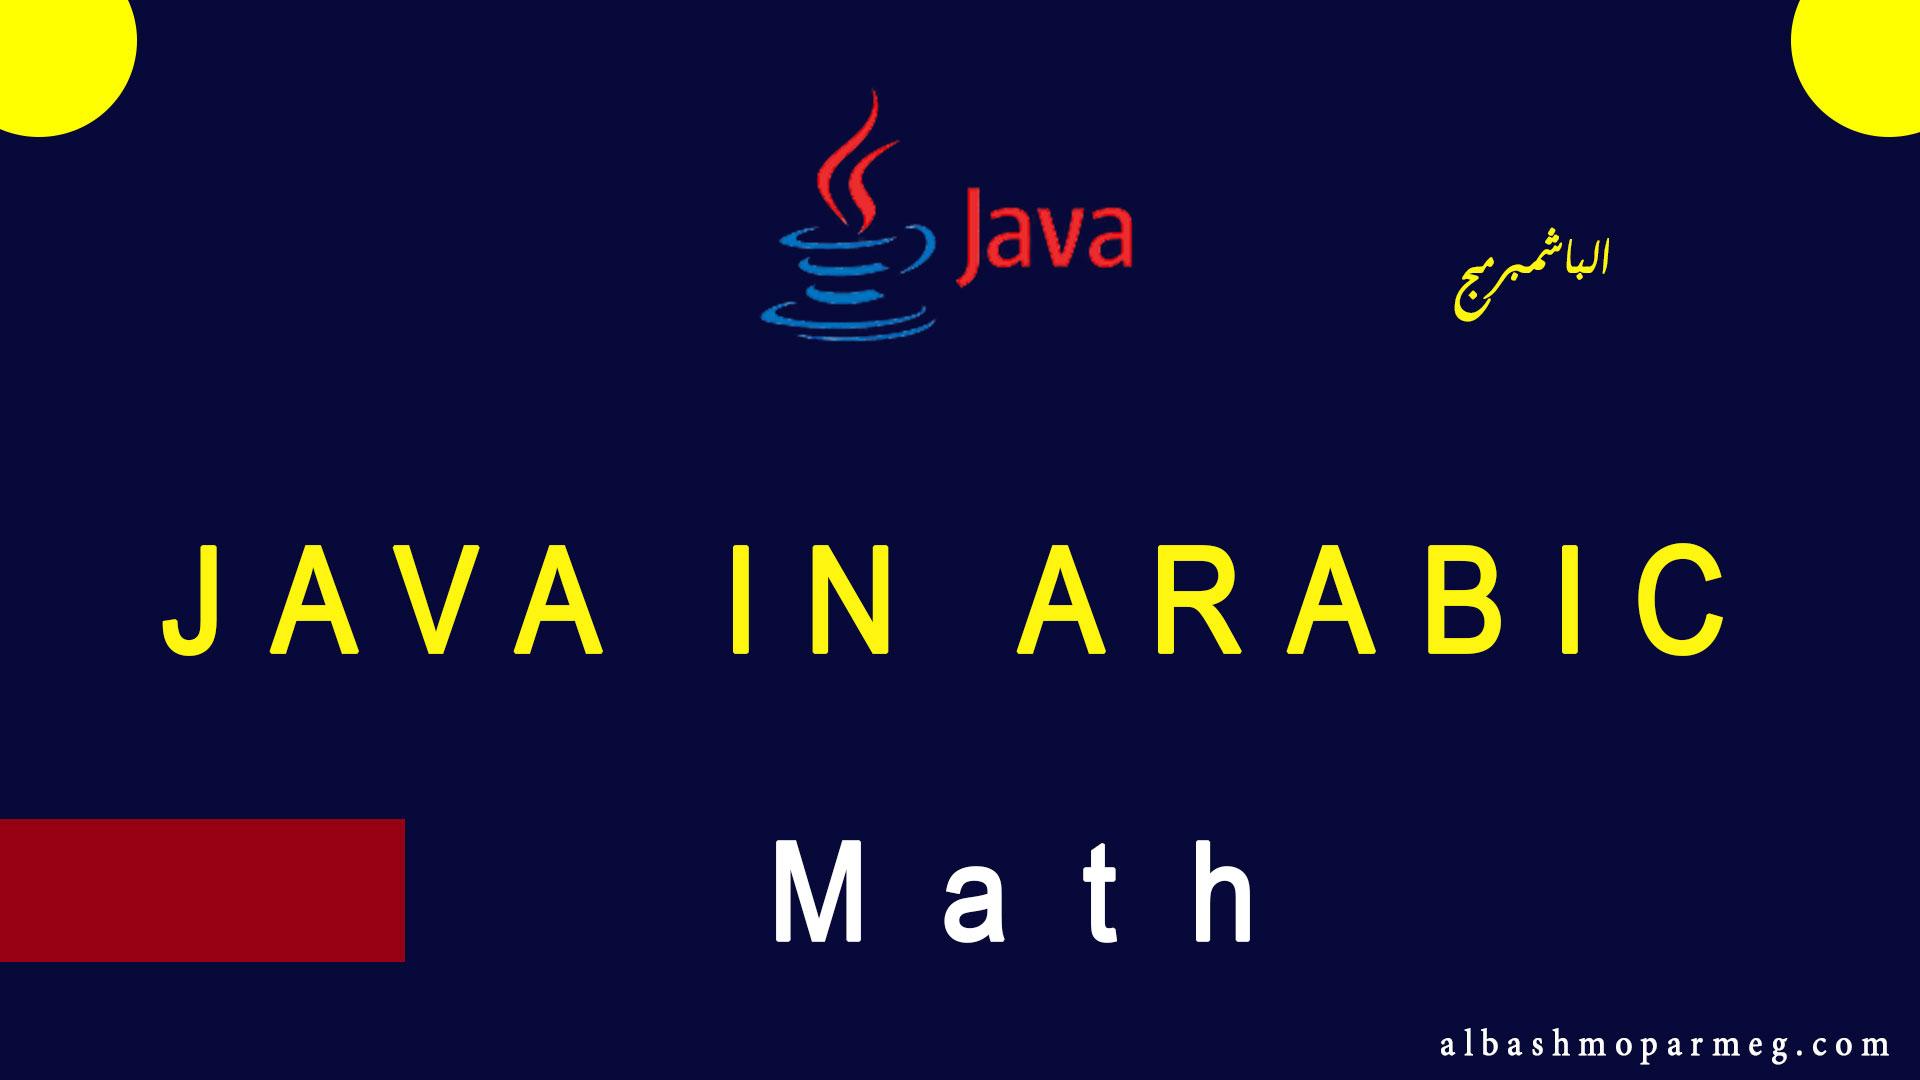 java math